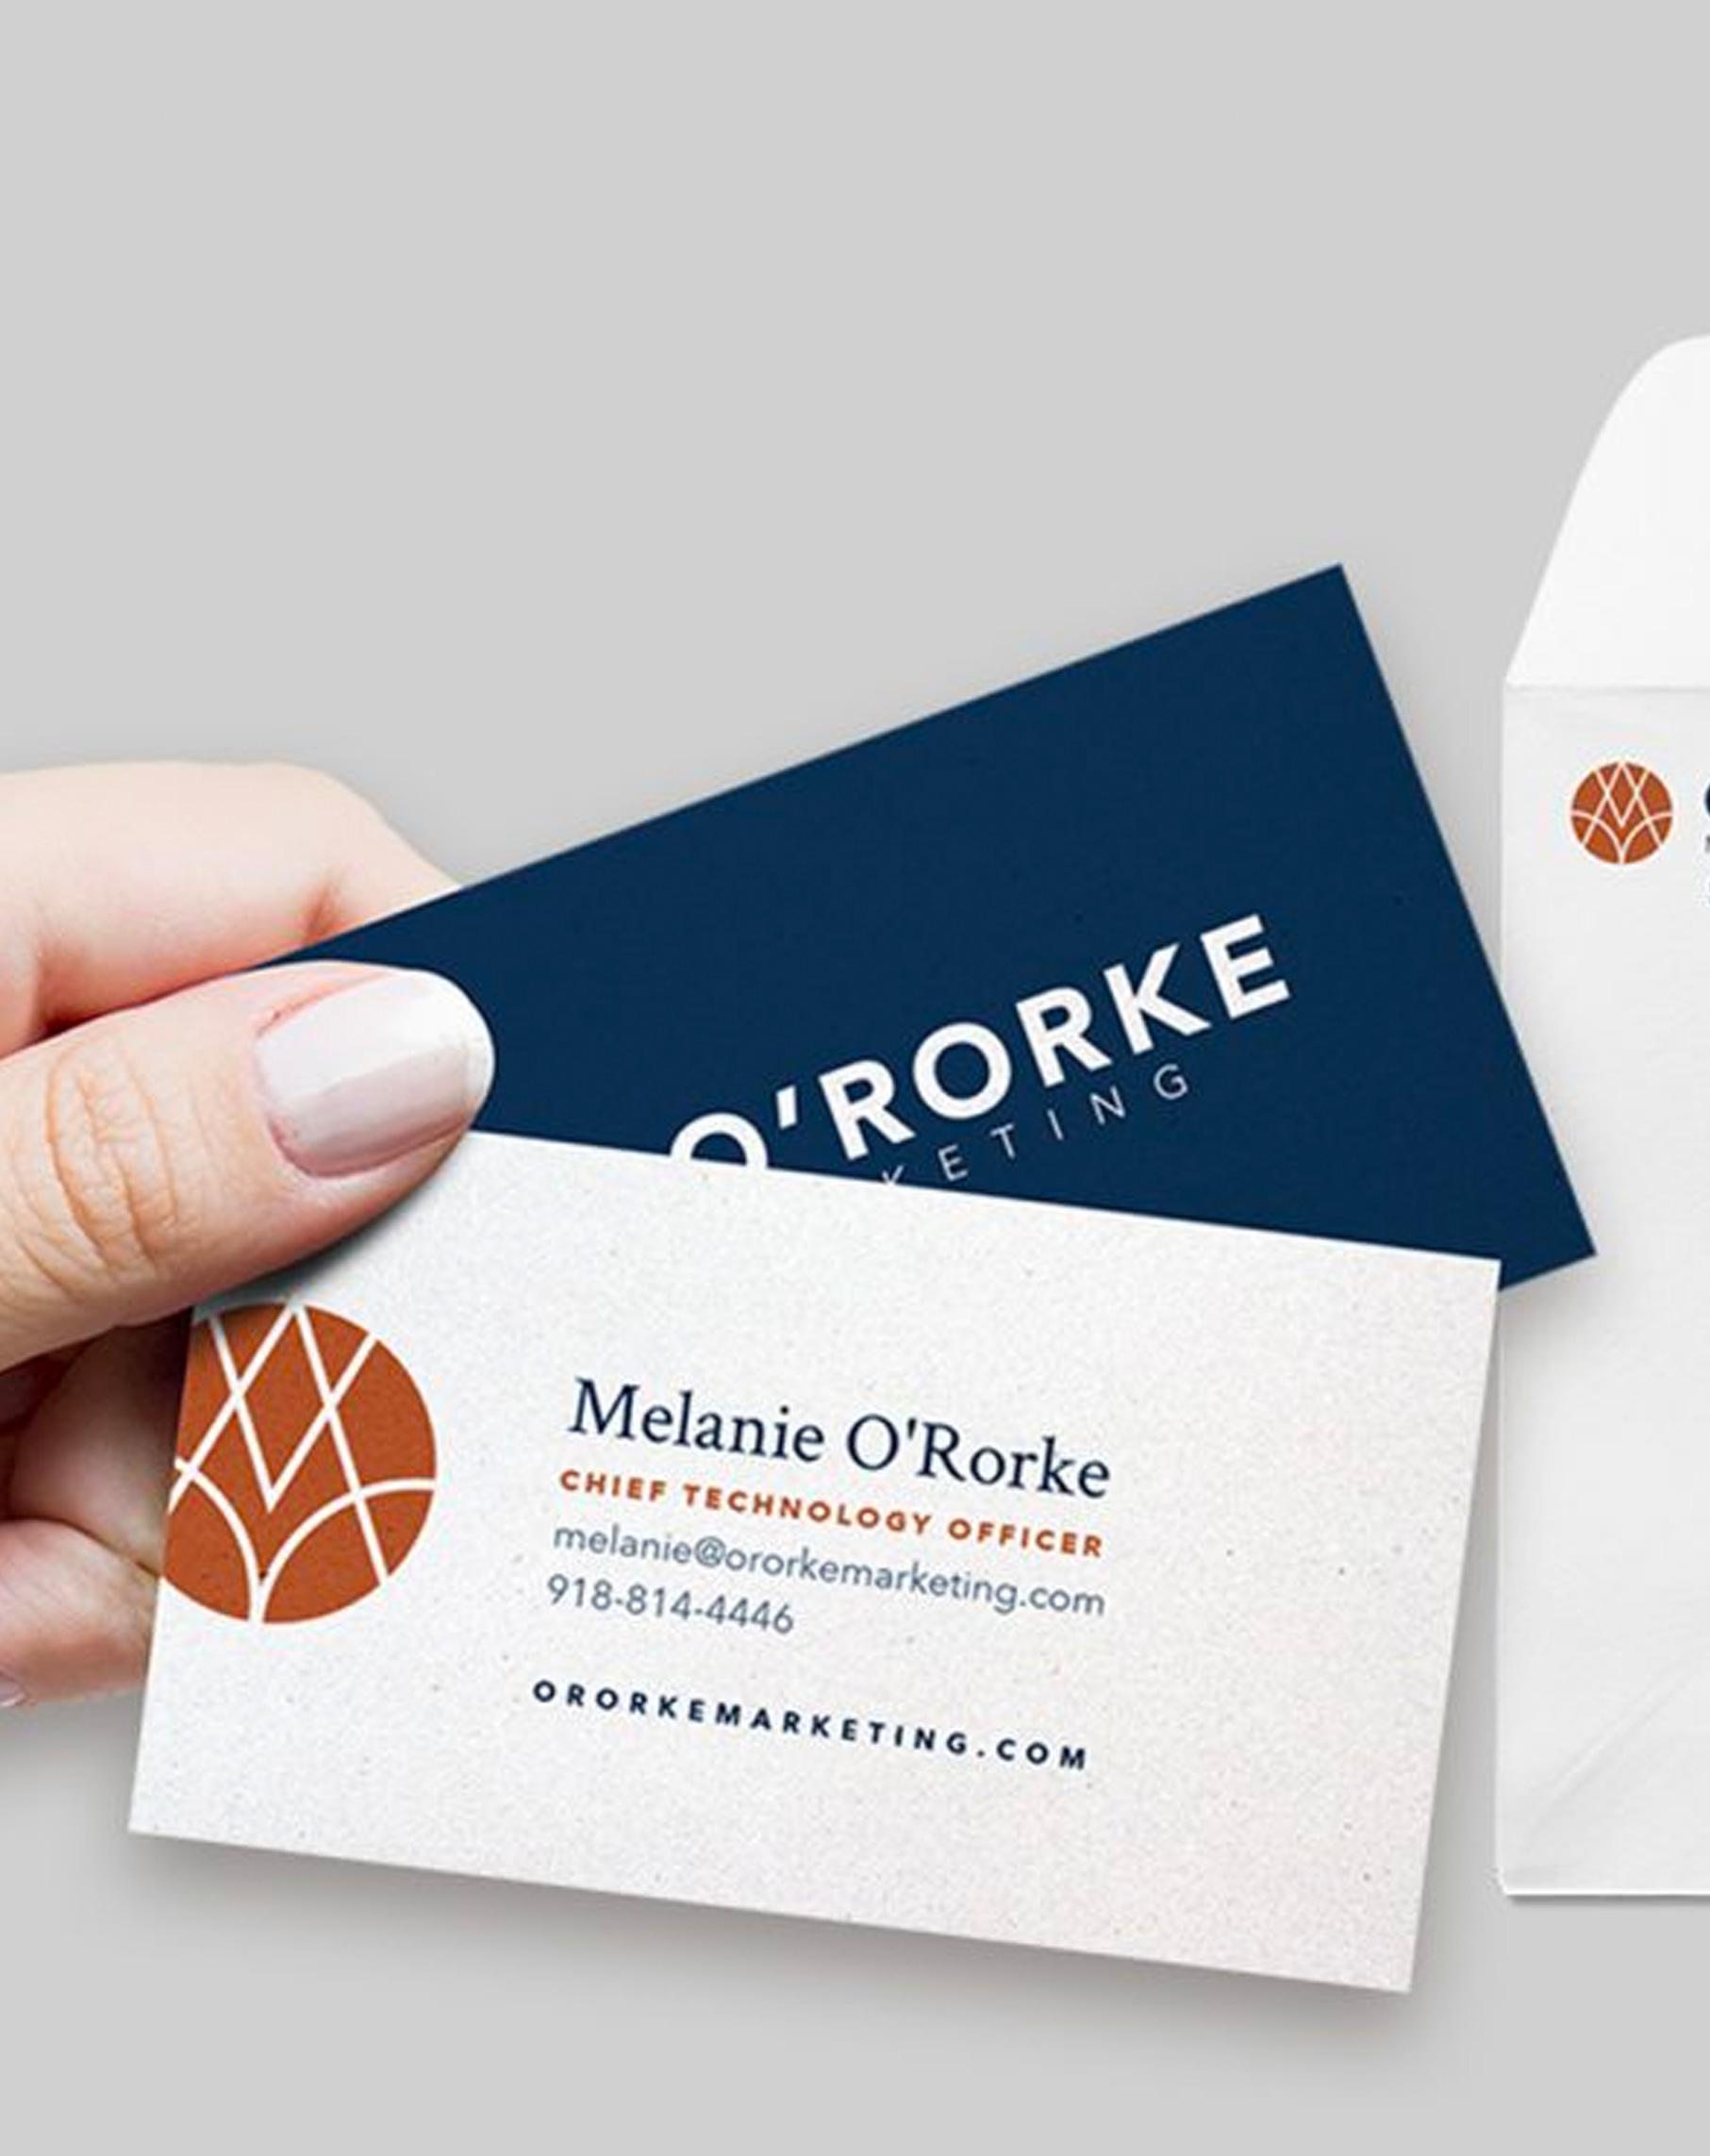 O'Rorke Marketing